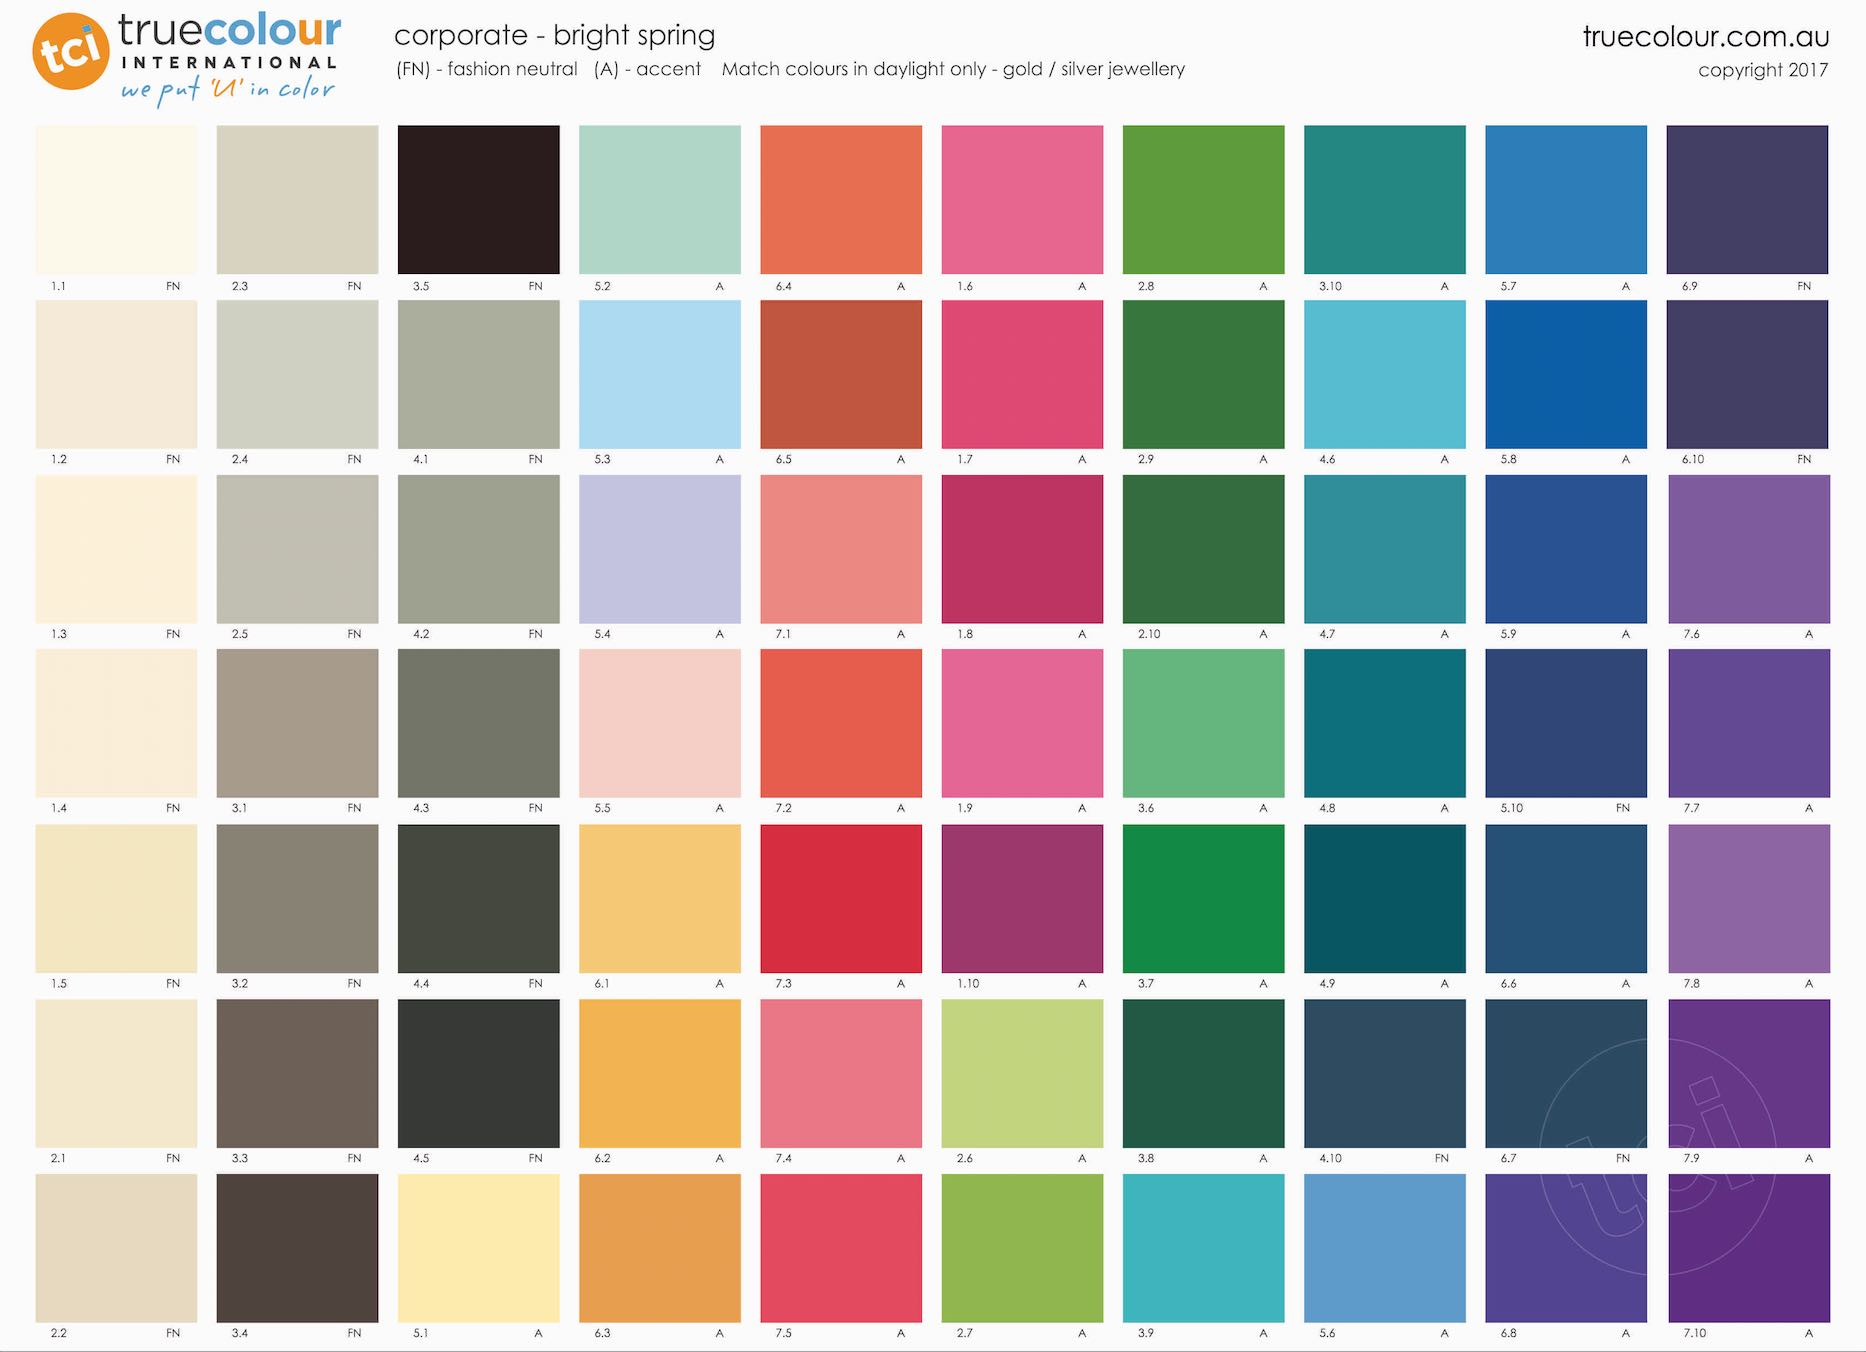 Bright Spring Poster - Corporate - True Colour International